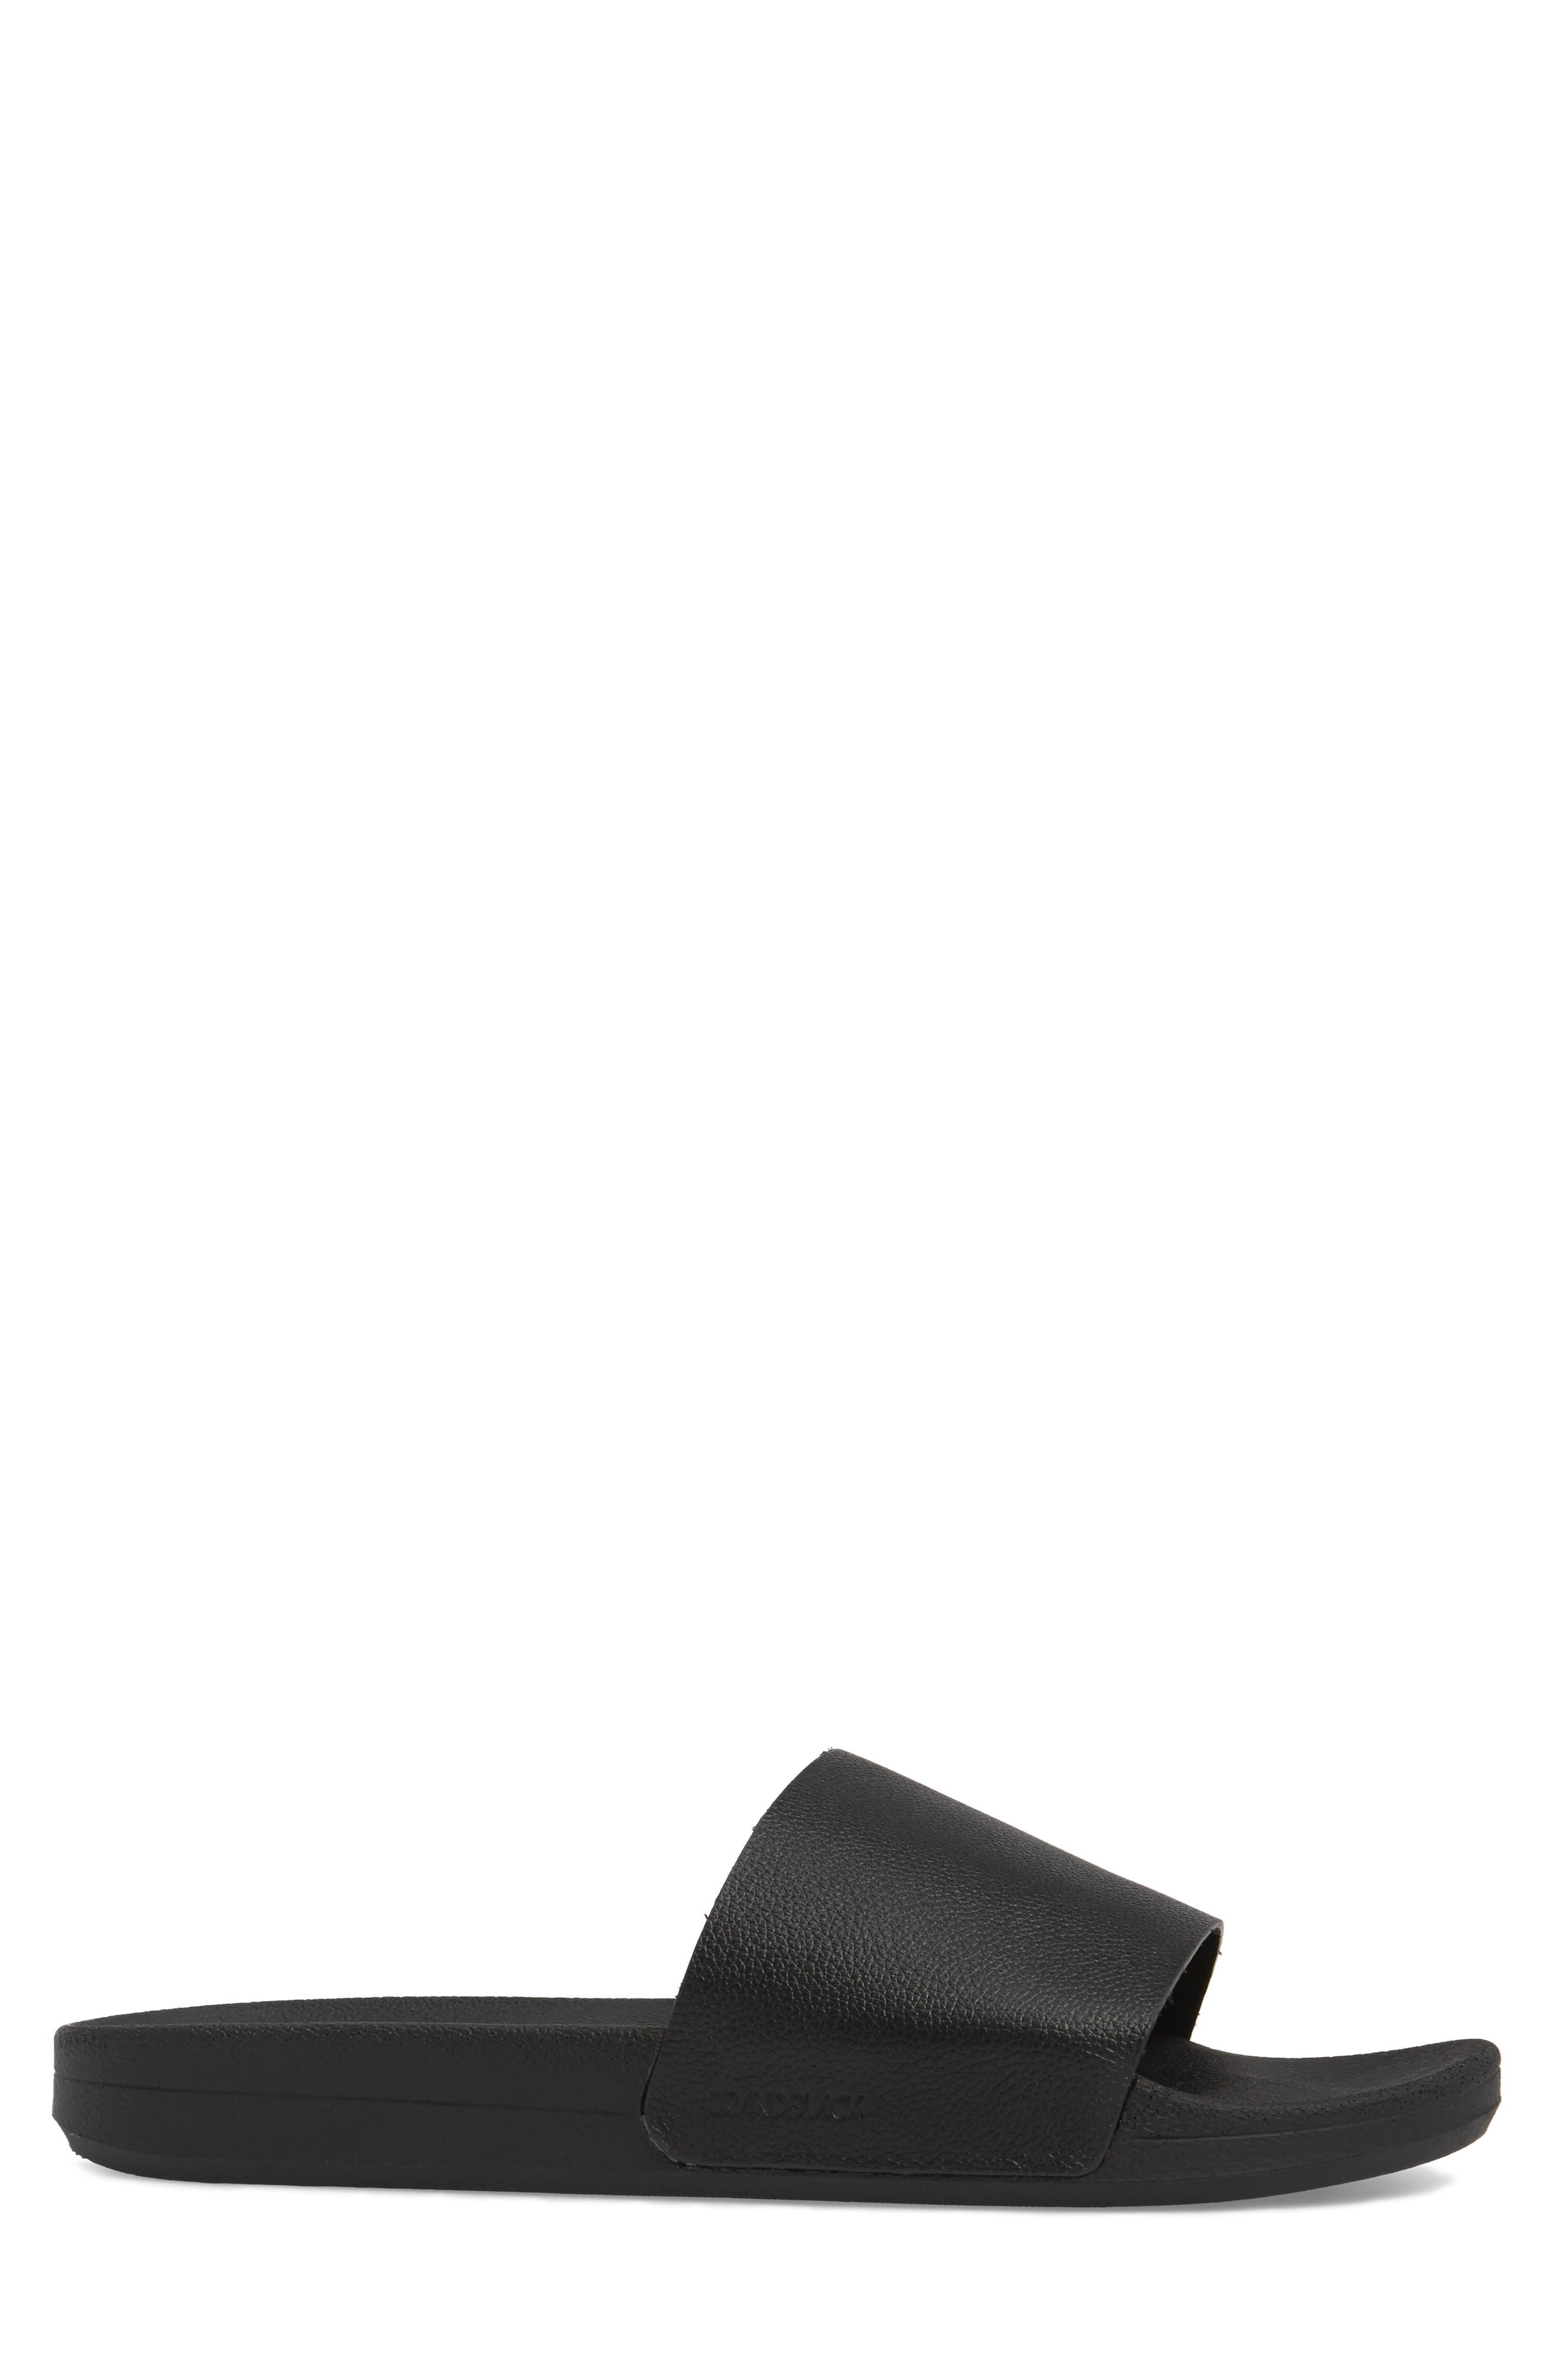 Kashiba Slide Sandal,                             Alternate thumbnail 3, color,                             017